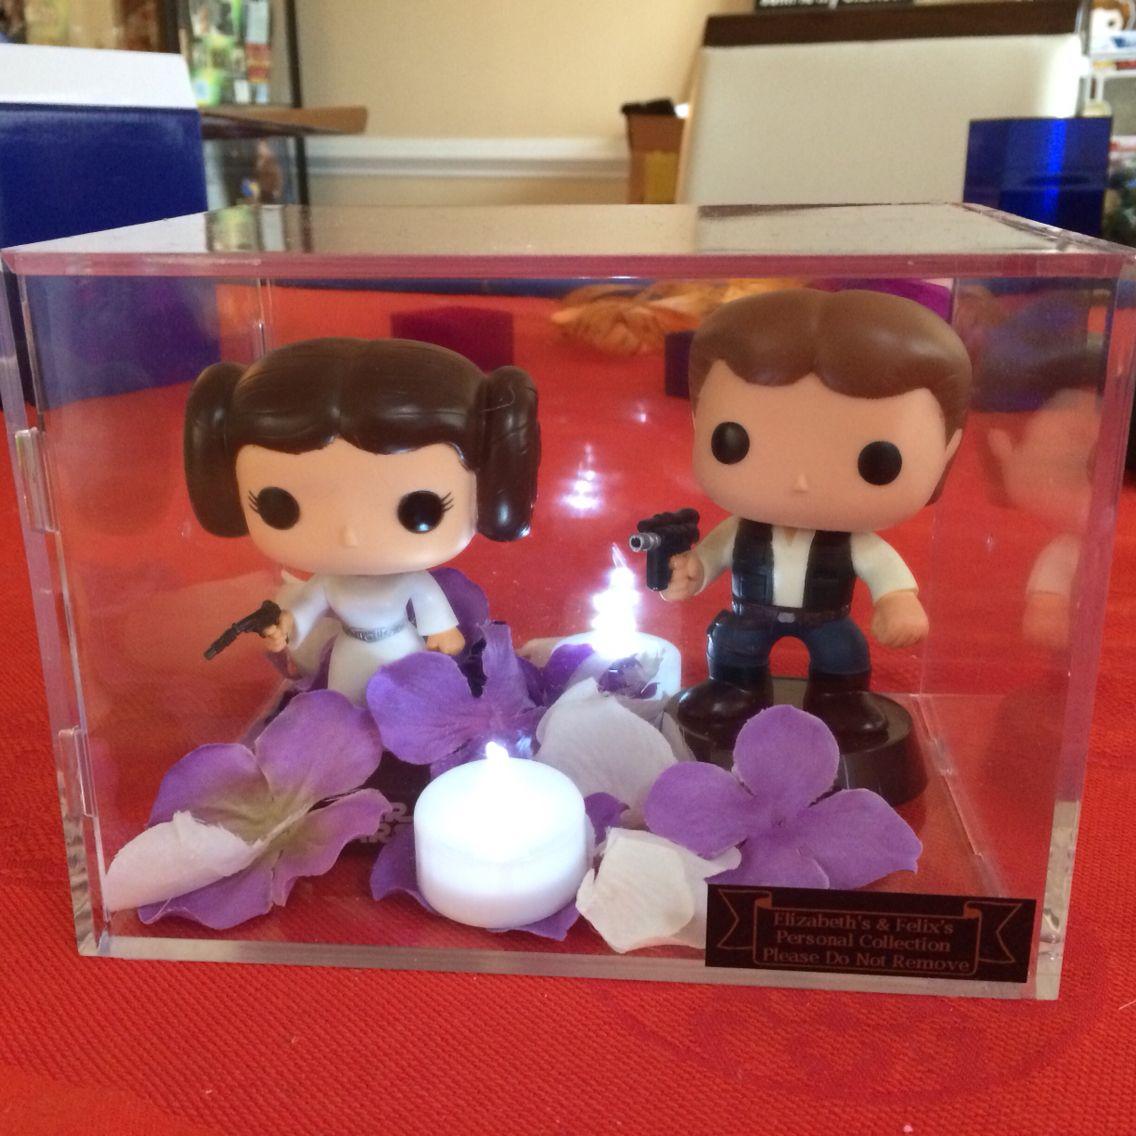 Supermarket Flower Arrangements Display Case Lighting: Centerpieces- Pop! Funko Vinyl Dolls In Display Cases, Add